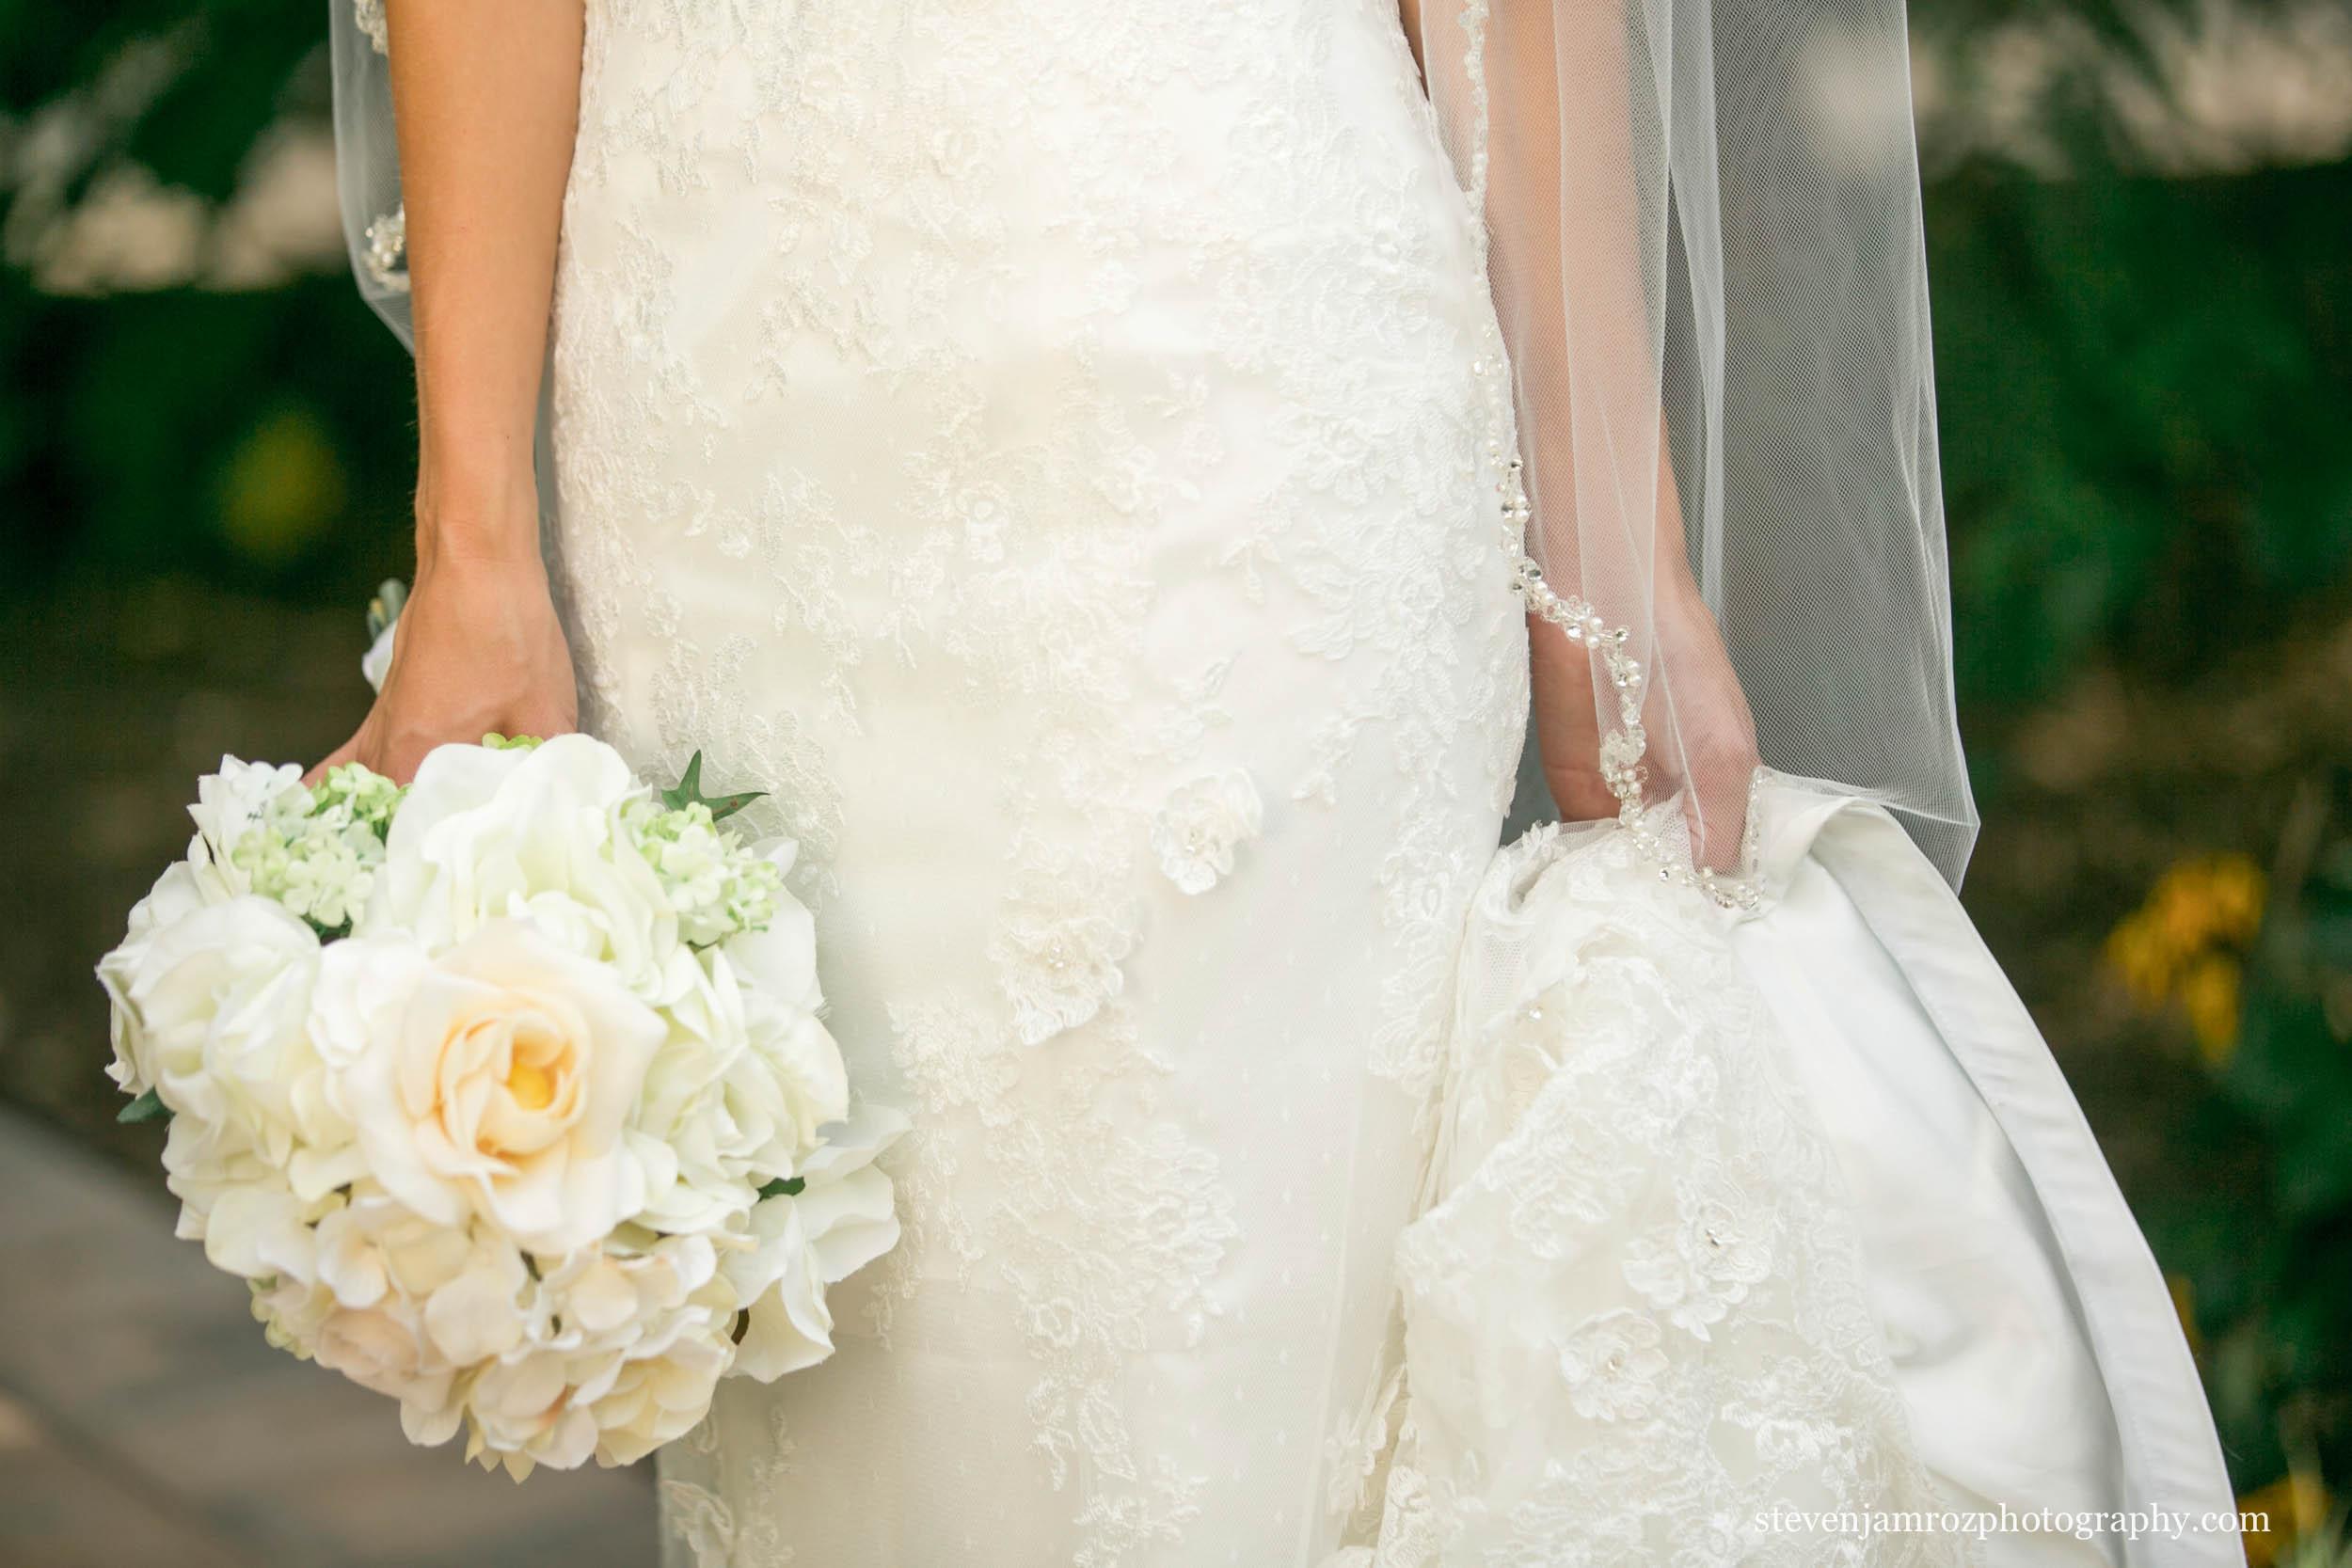 nc-state-jc-raulston-wedding-steven-jamroz-photography-0539.jpg